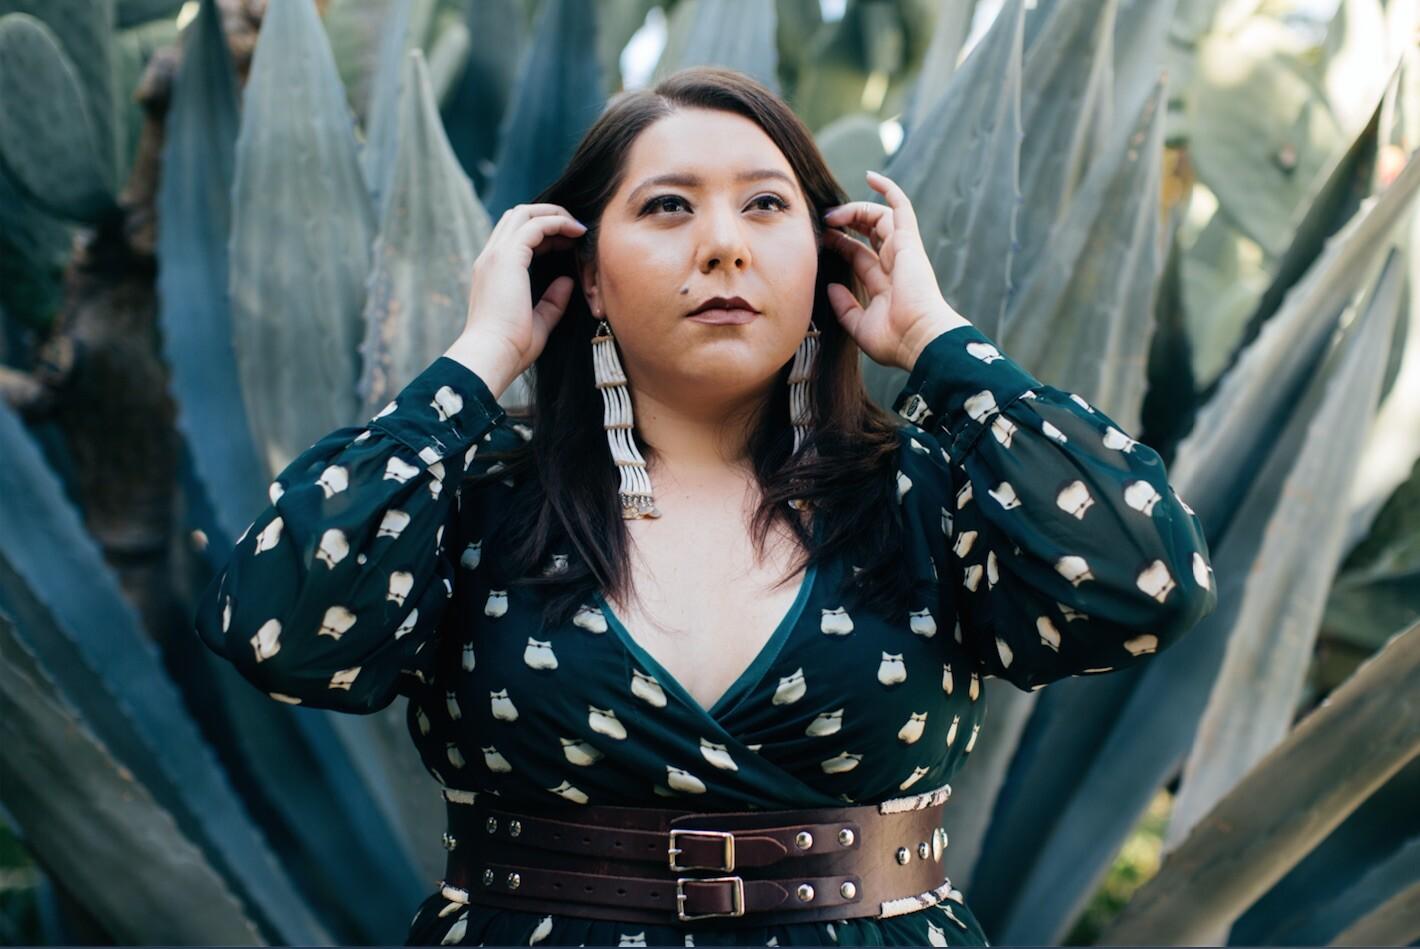 Native American fashion designer Bethany Yellowtail